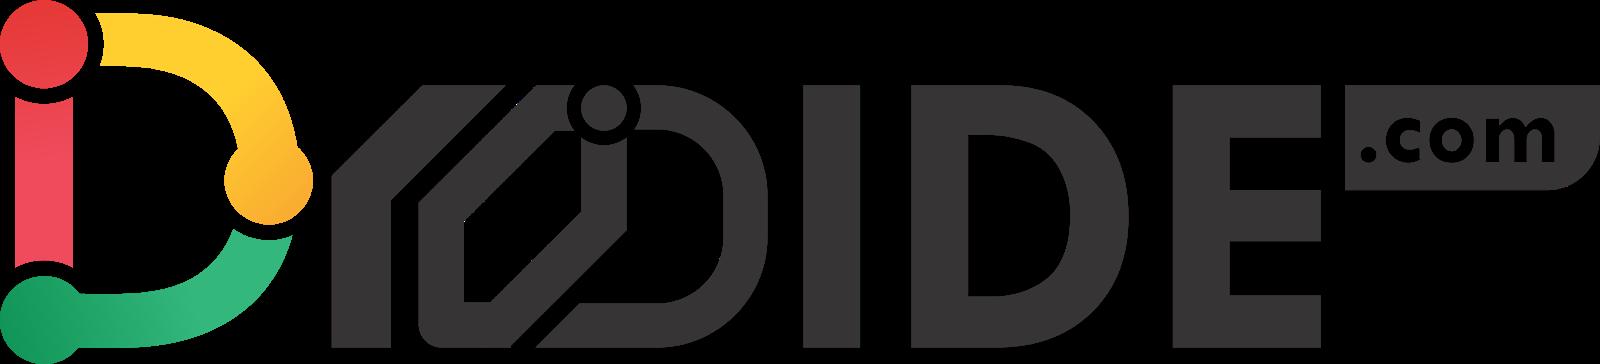 Cara Mengganti Judul Blog Header Dengan Logo atau Gambar